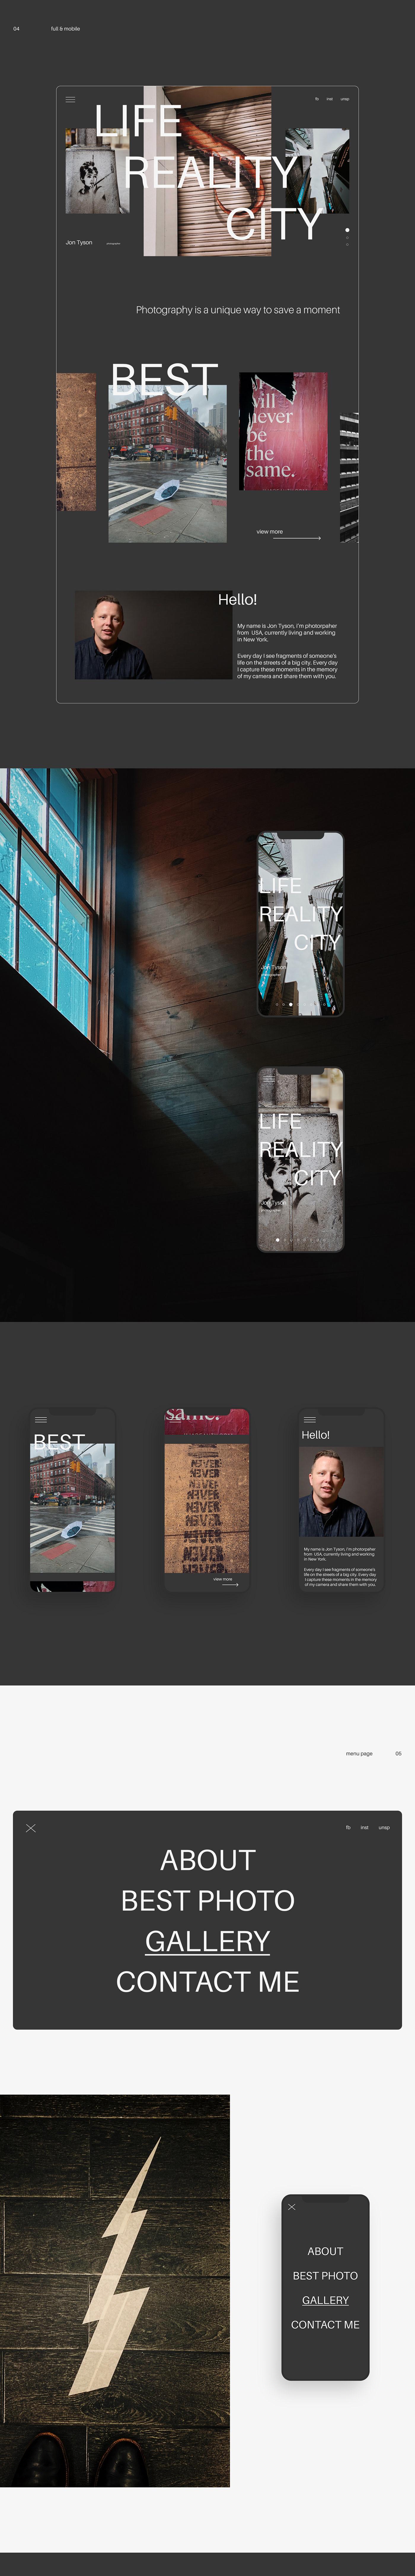 city interaction Interface landing page minimal New York photo photographer portfolio Website